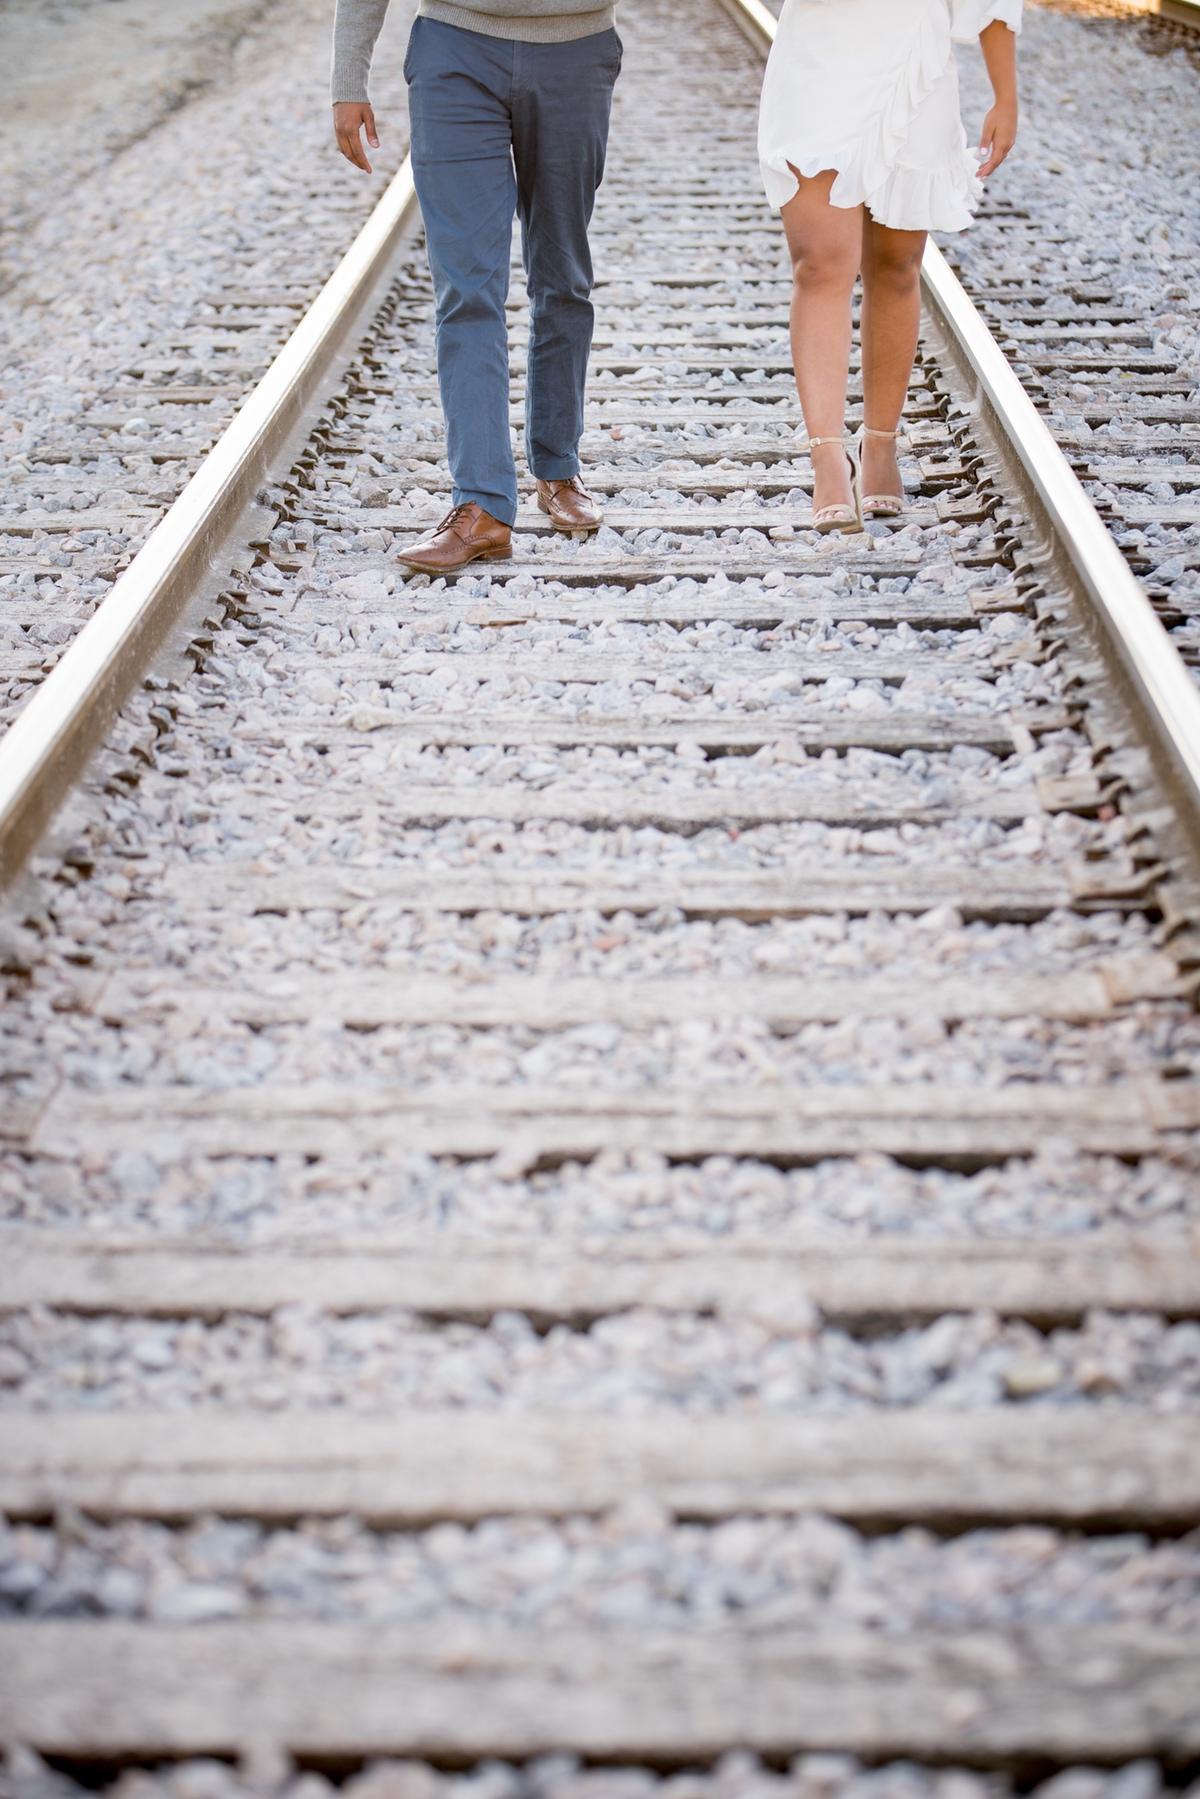 Train - Tracks in the City